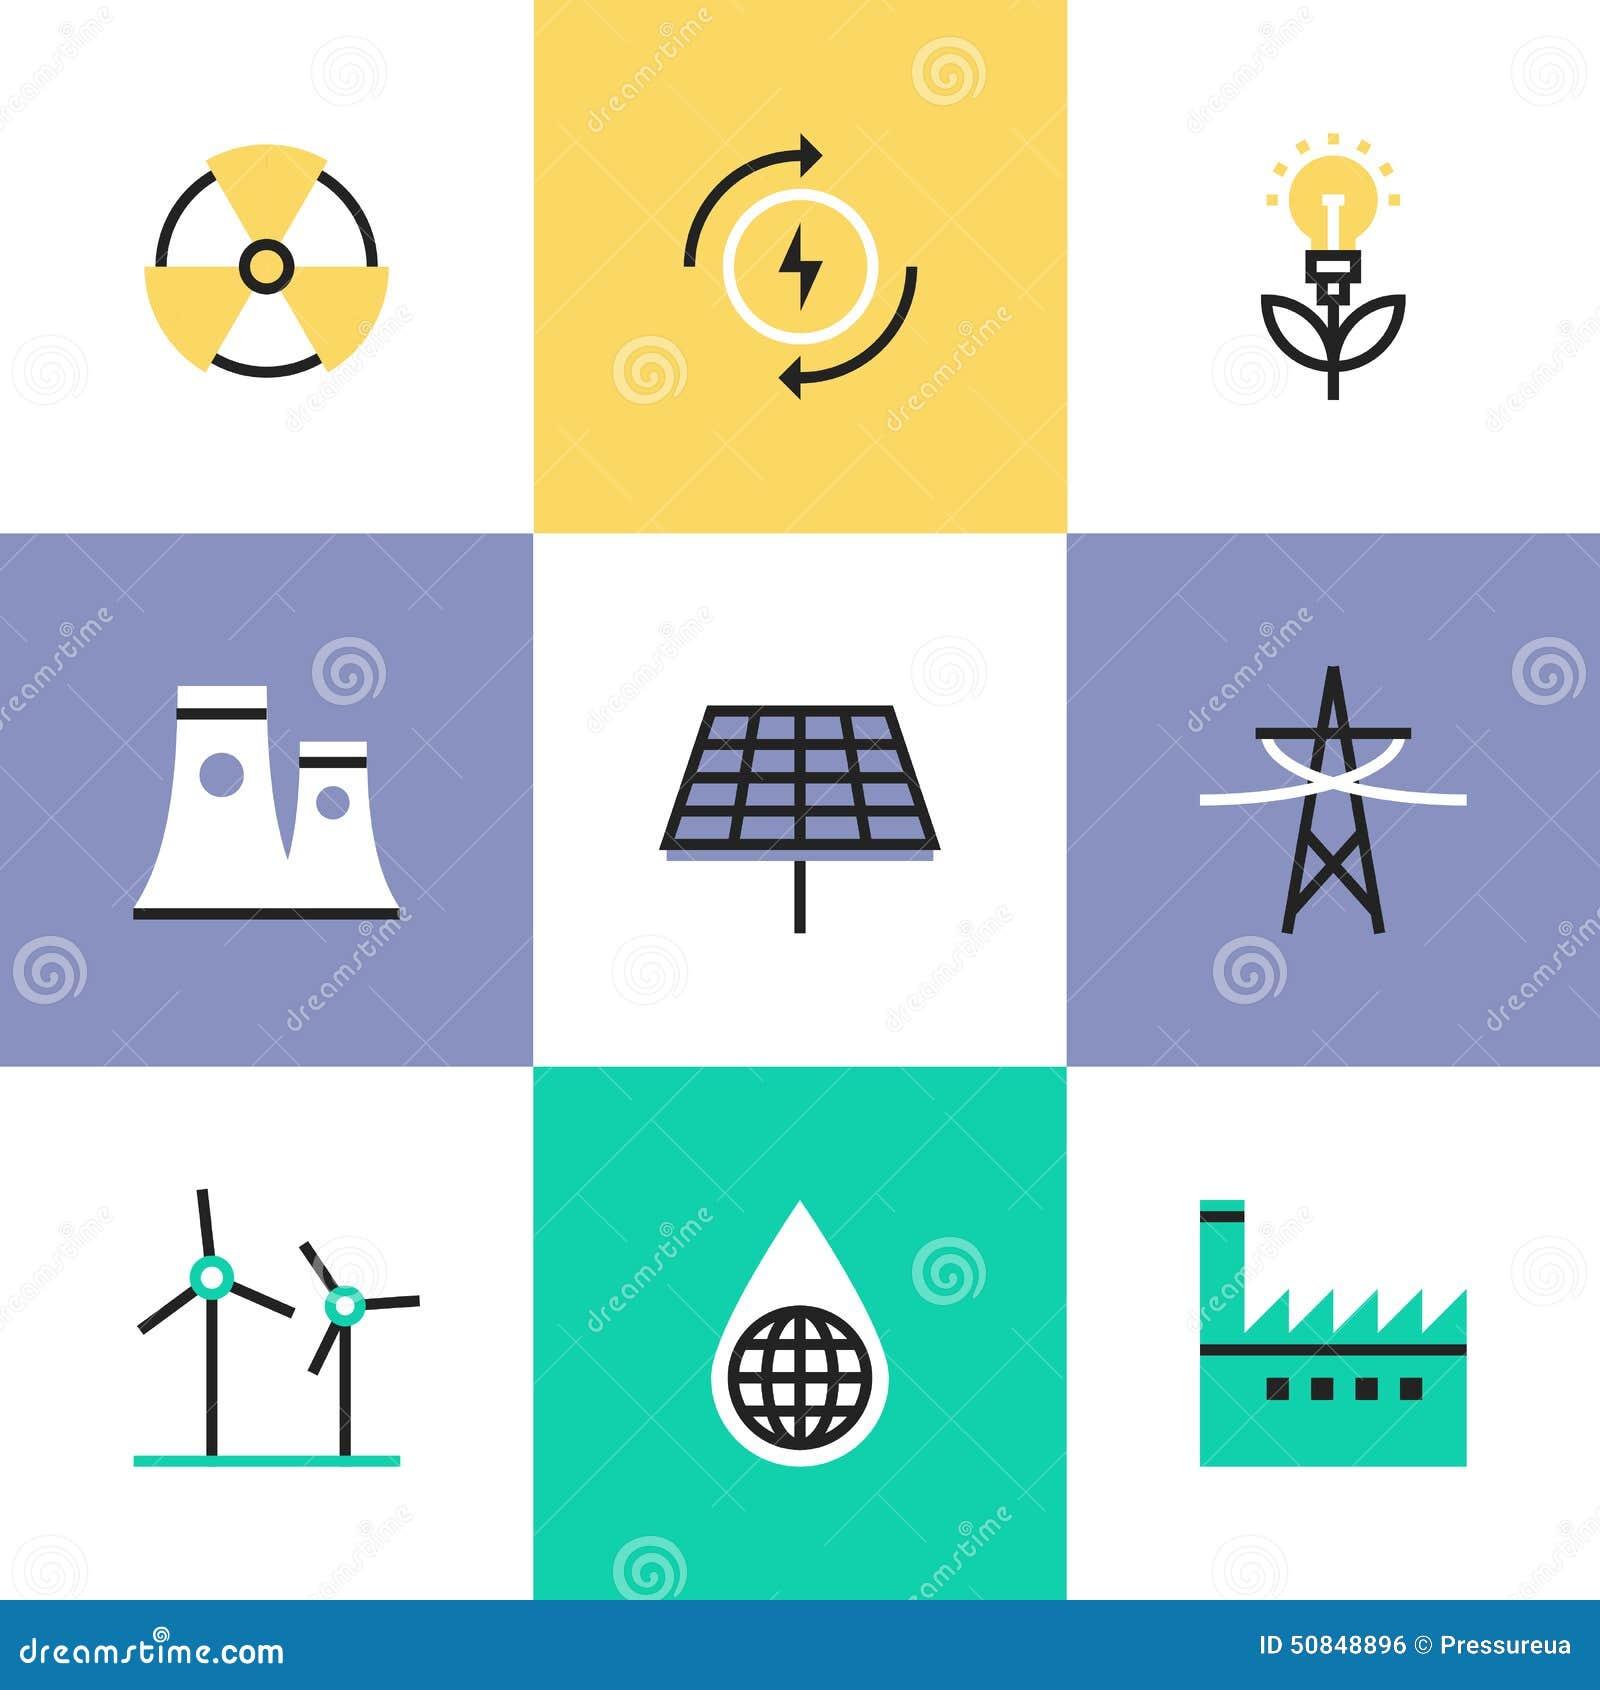 Renewable Energy Production Pictogram Icons Set Stock ...